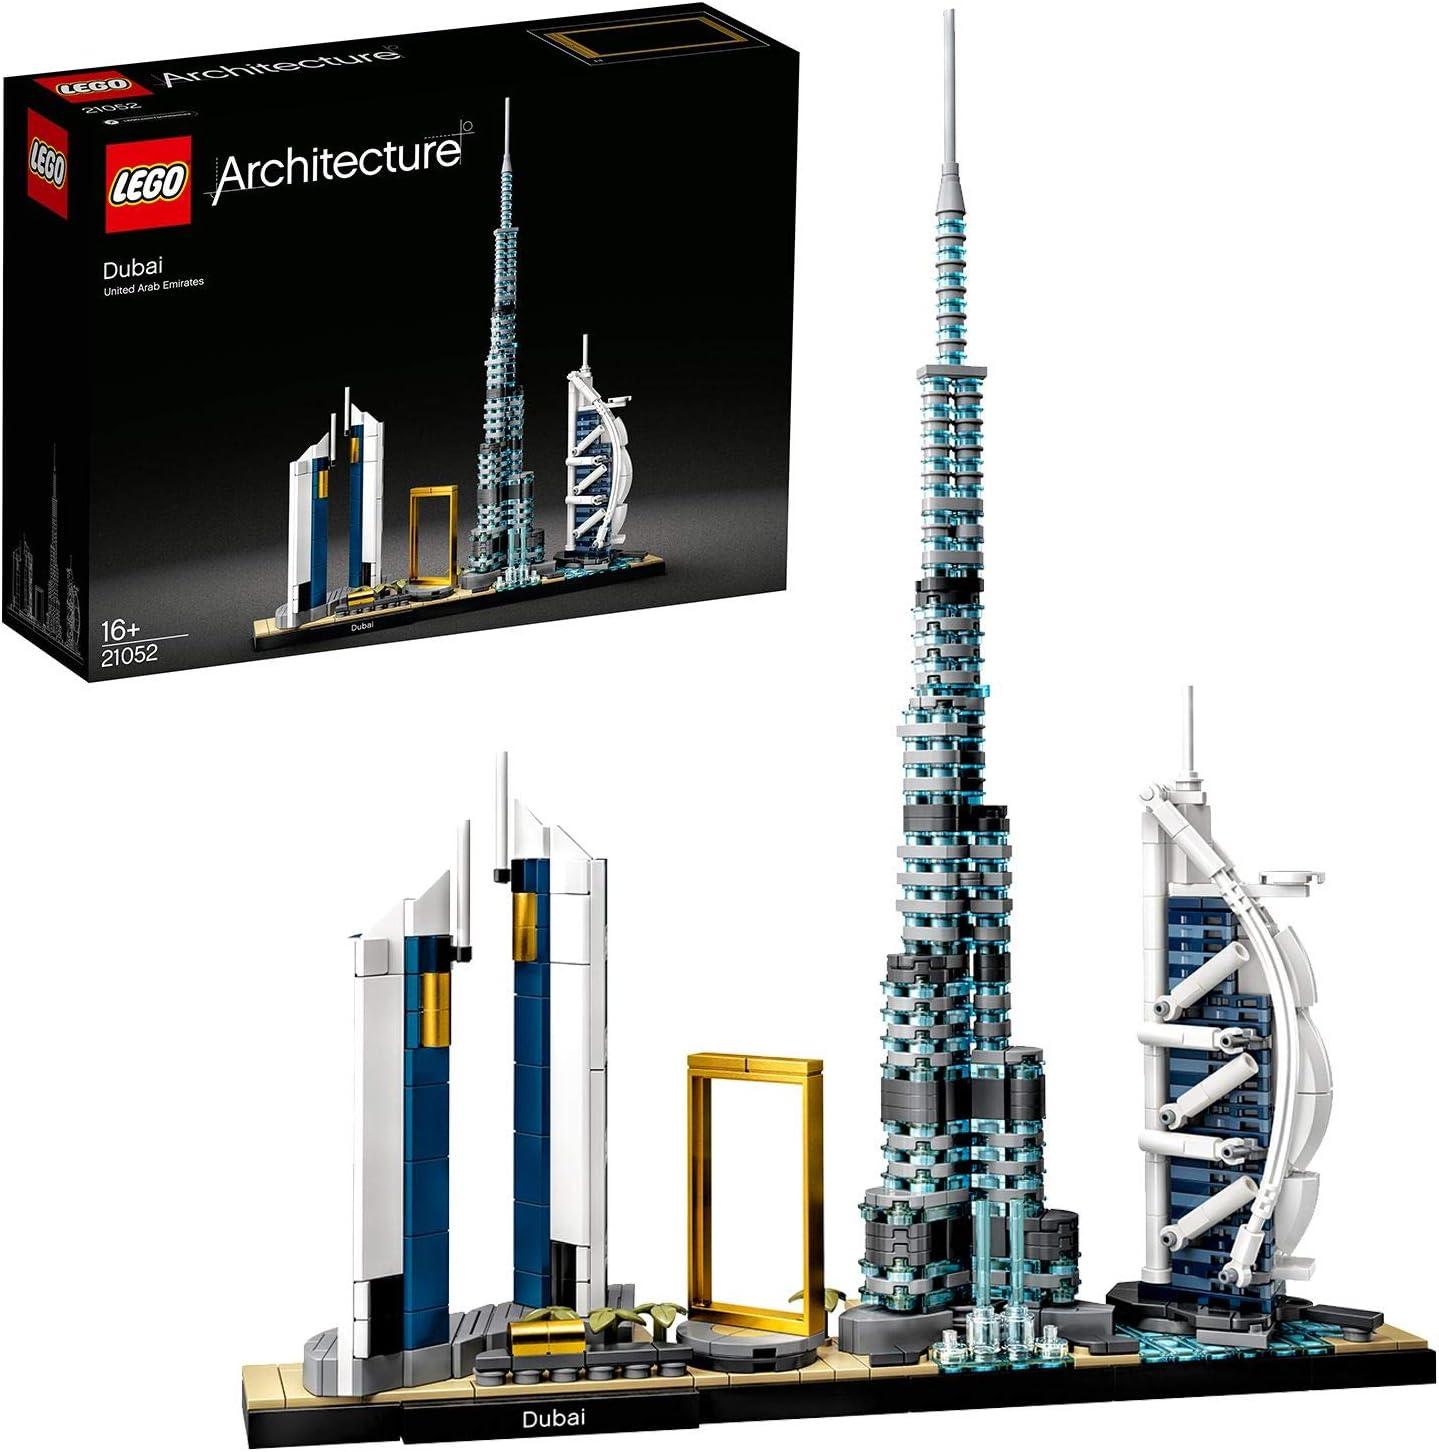 Amazon Prime - LEGO Architecture 21052 Dubai (Skyline-Kollektion) für nur 39,99€